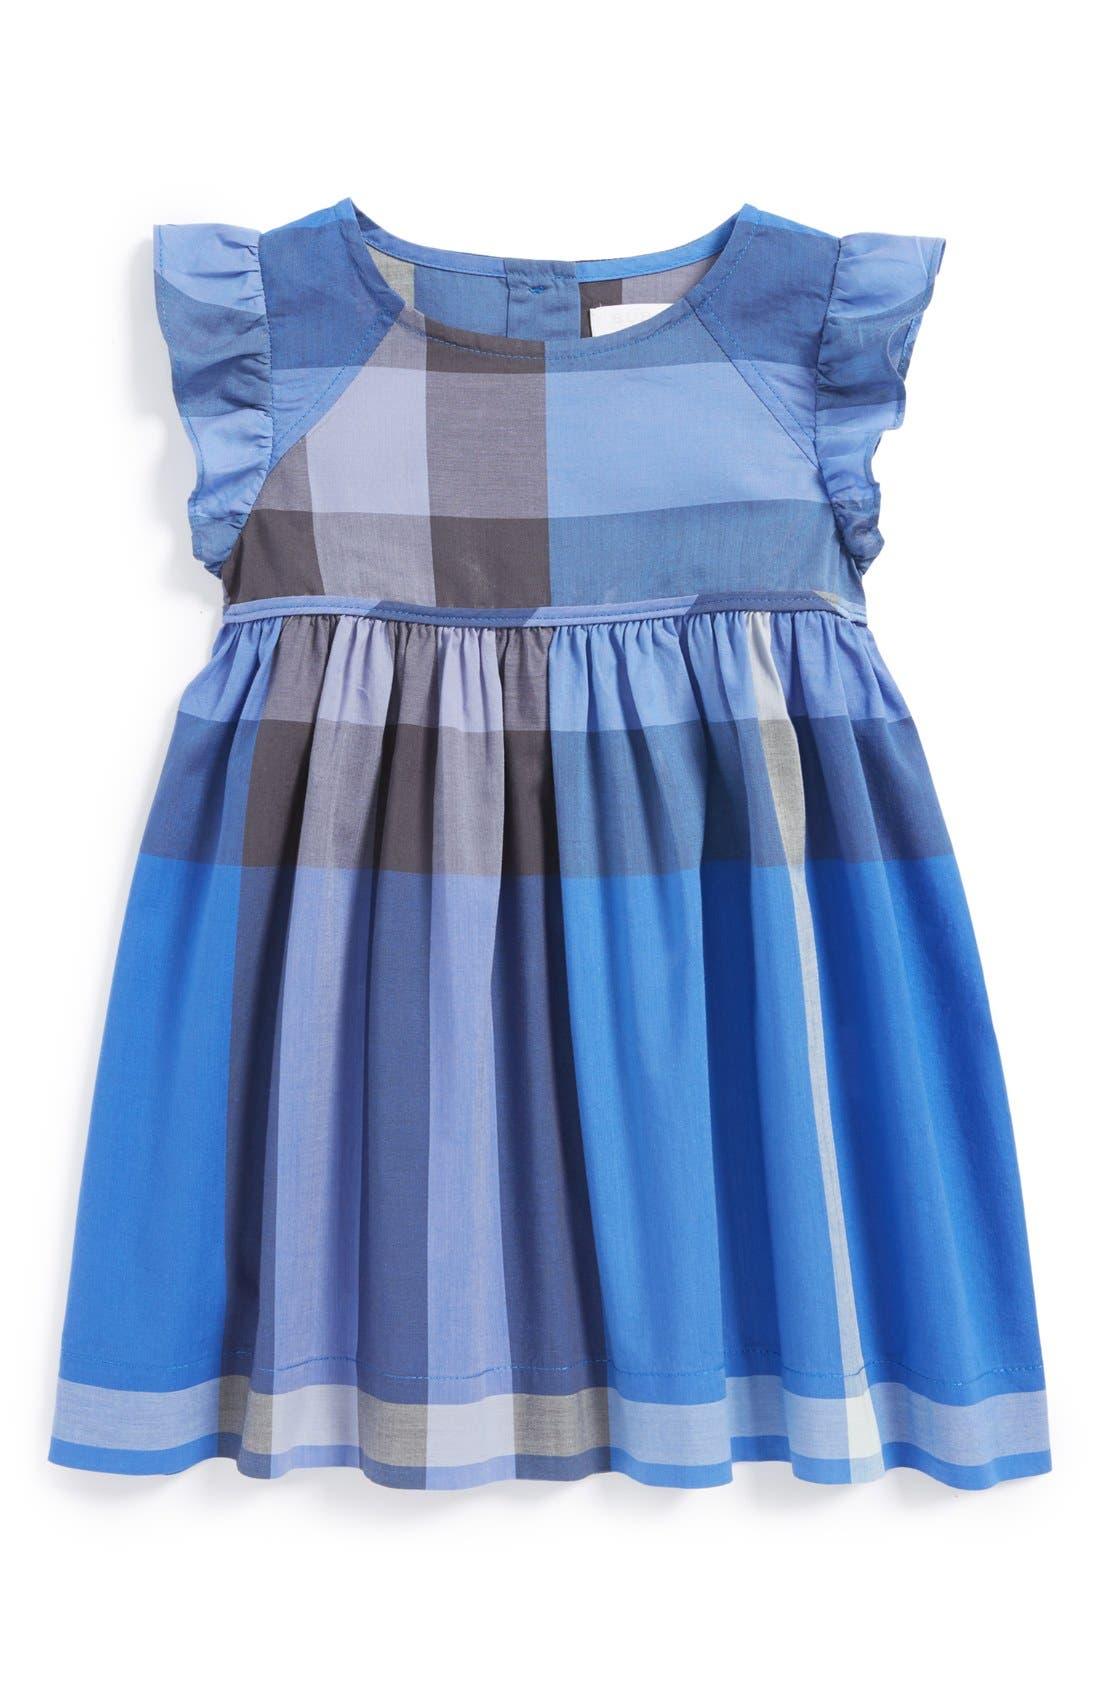 Alternate Image 1 Selected - Burberry Flutter Sleeve Dress (Baby Girls)